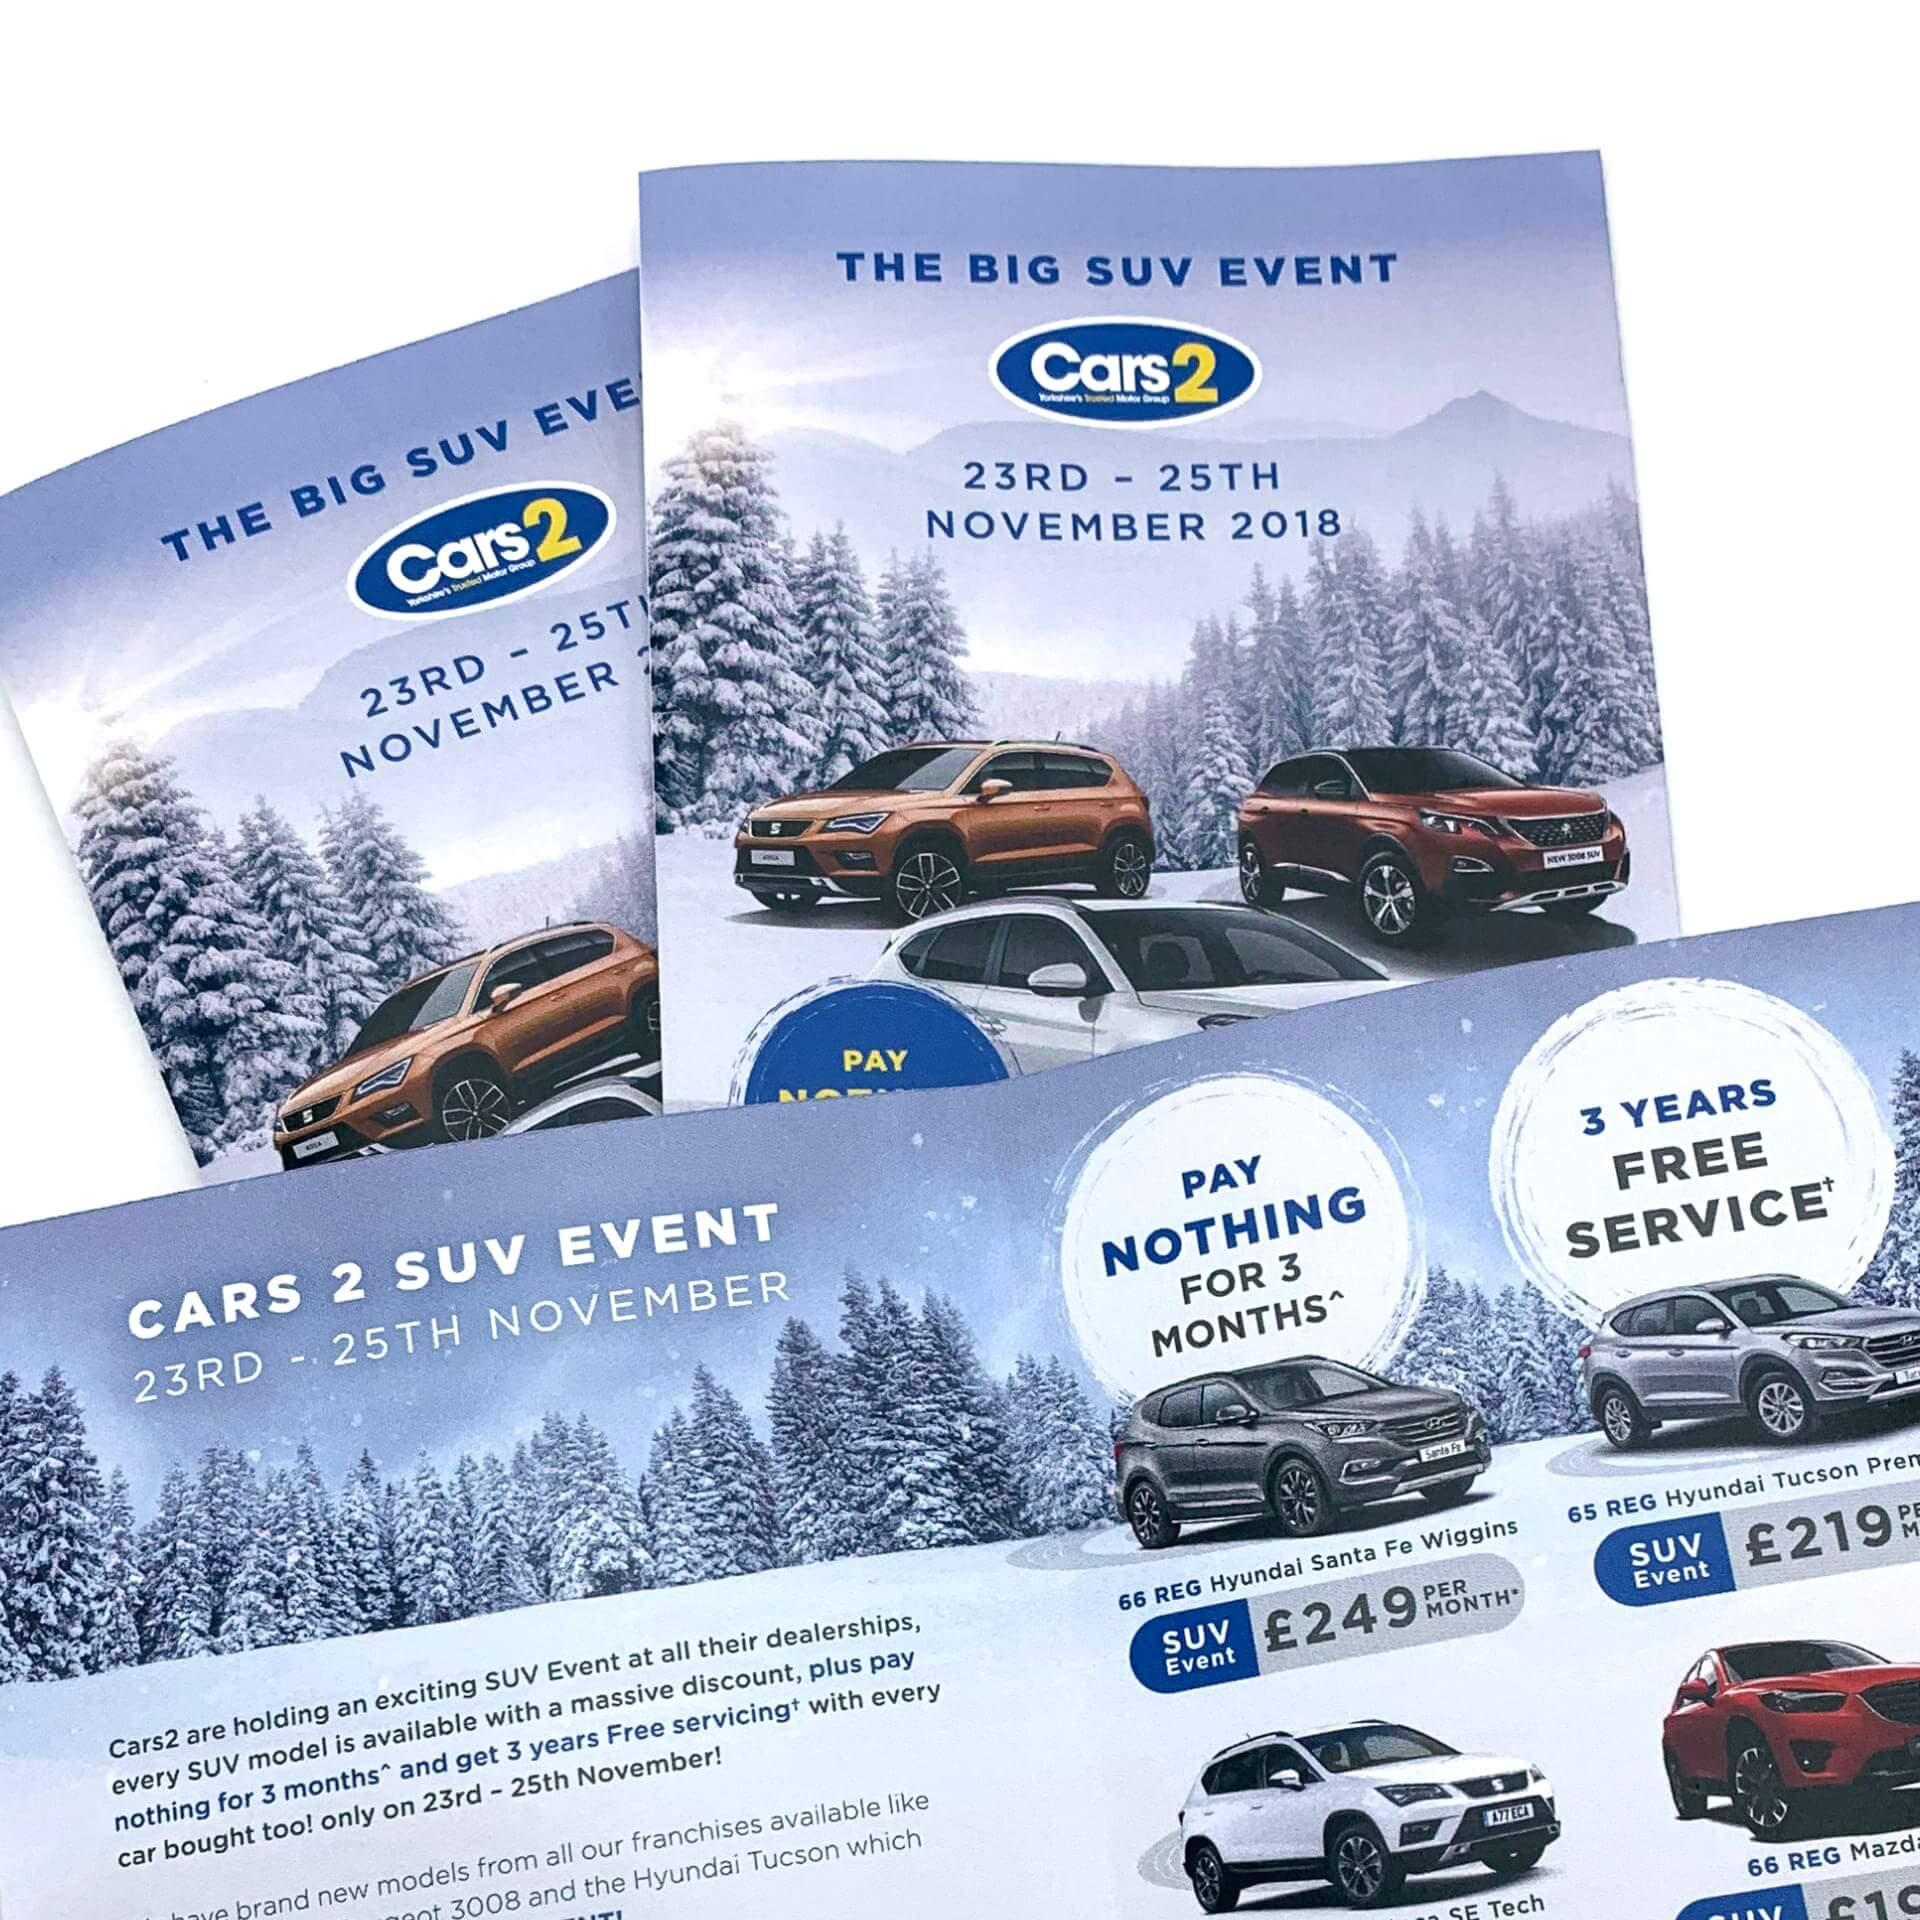 Cars 2 Winter SUV artwork